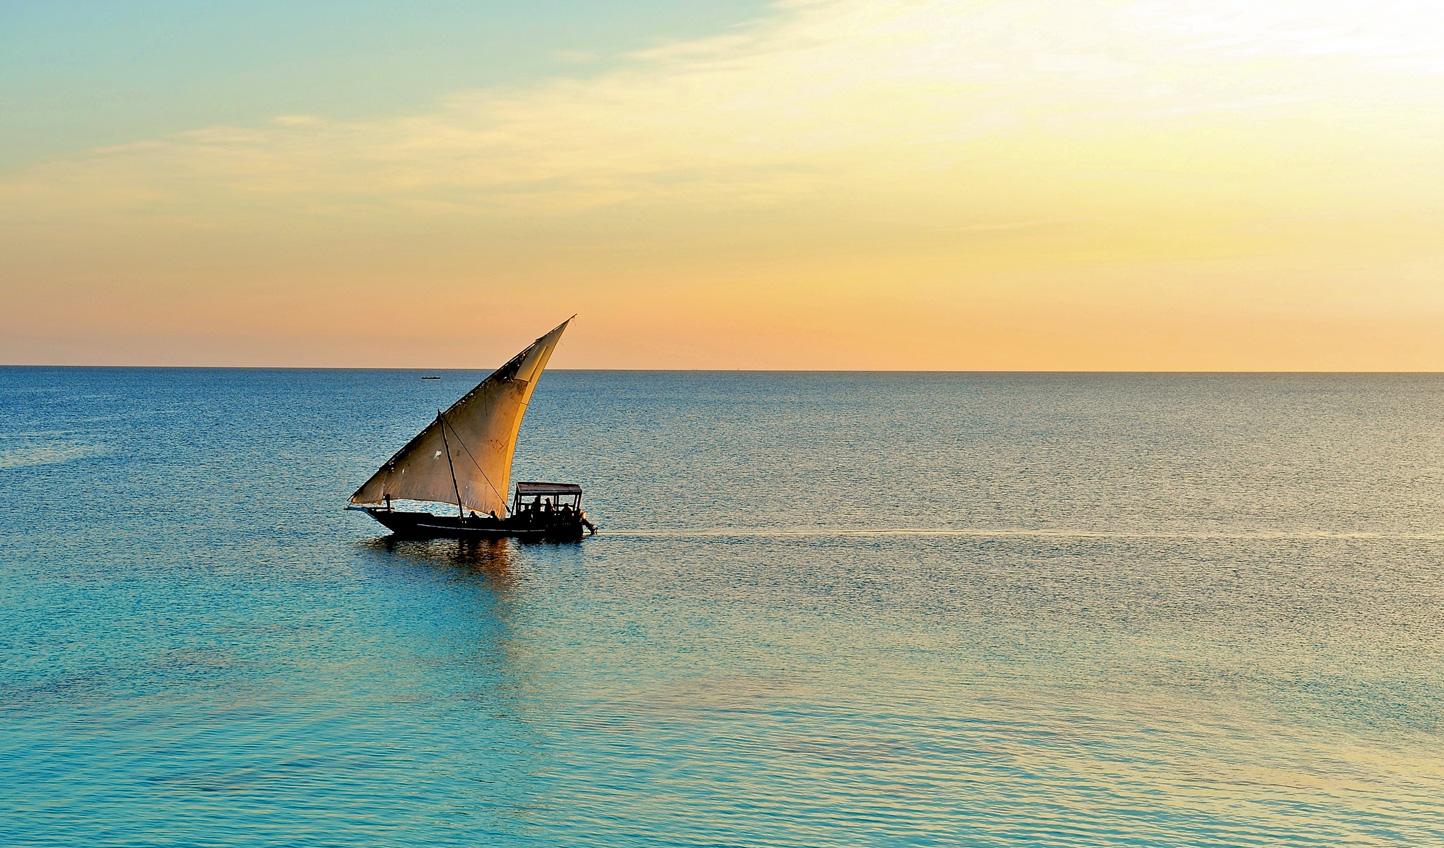 Set sail around Mnemba Island at sunset